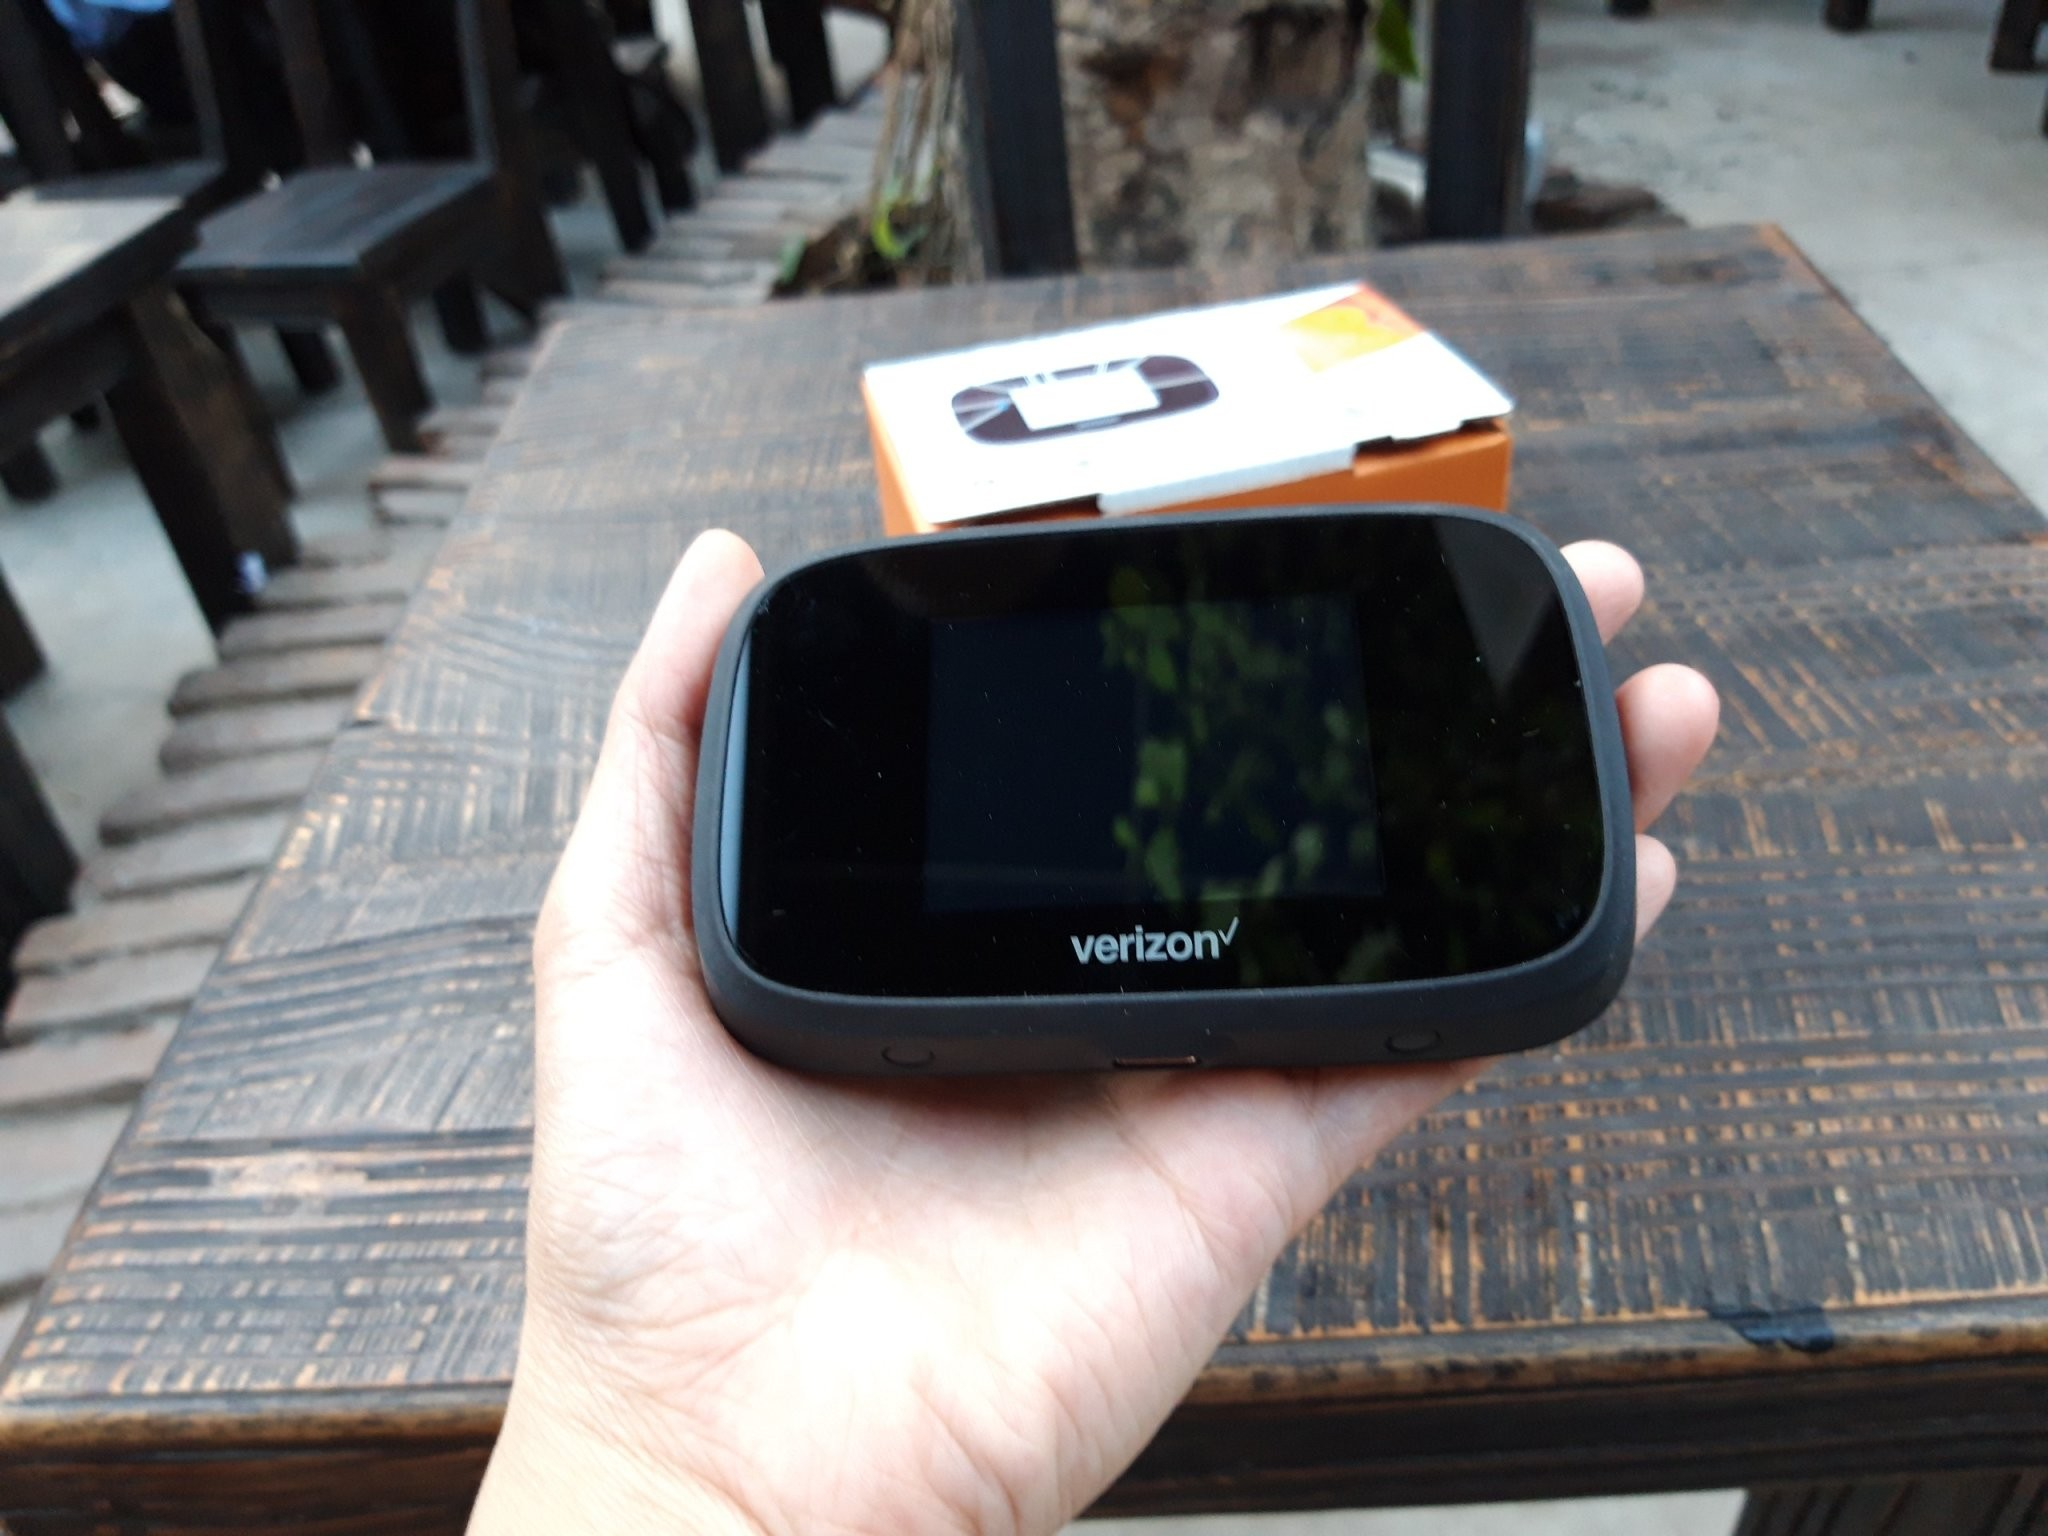 Bộ Phát WiFi 4G Verizon Jetpack MiFi 7730L 13960509   Cửa